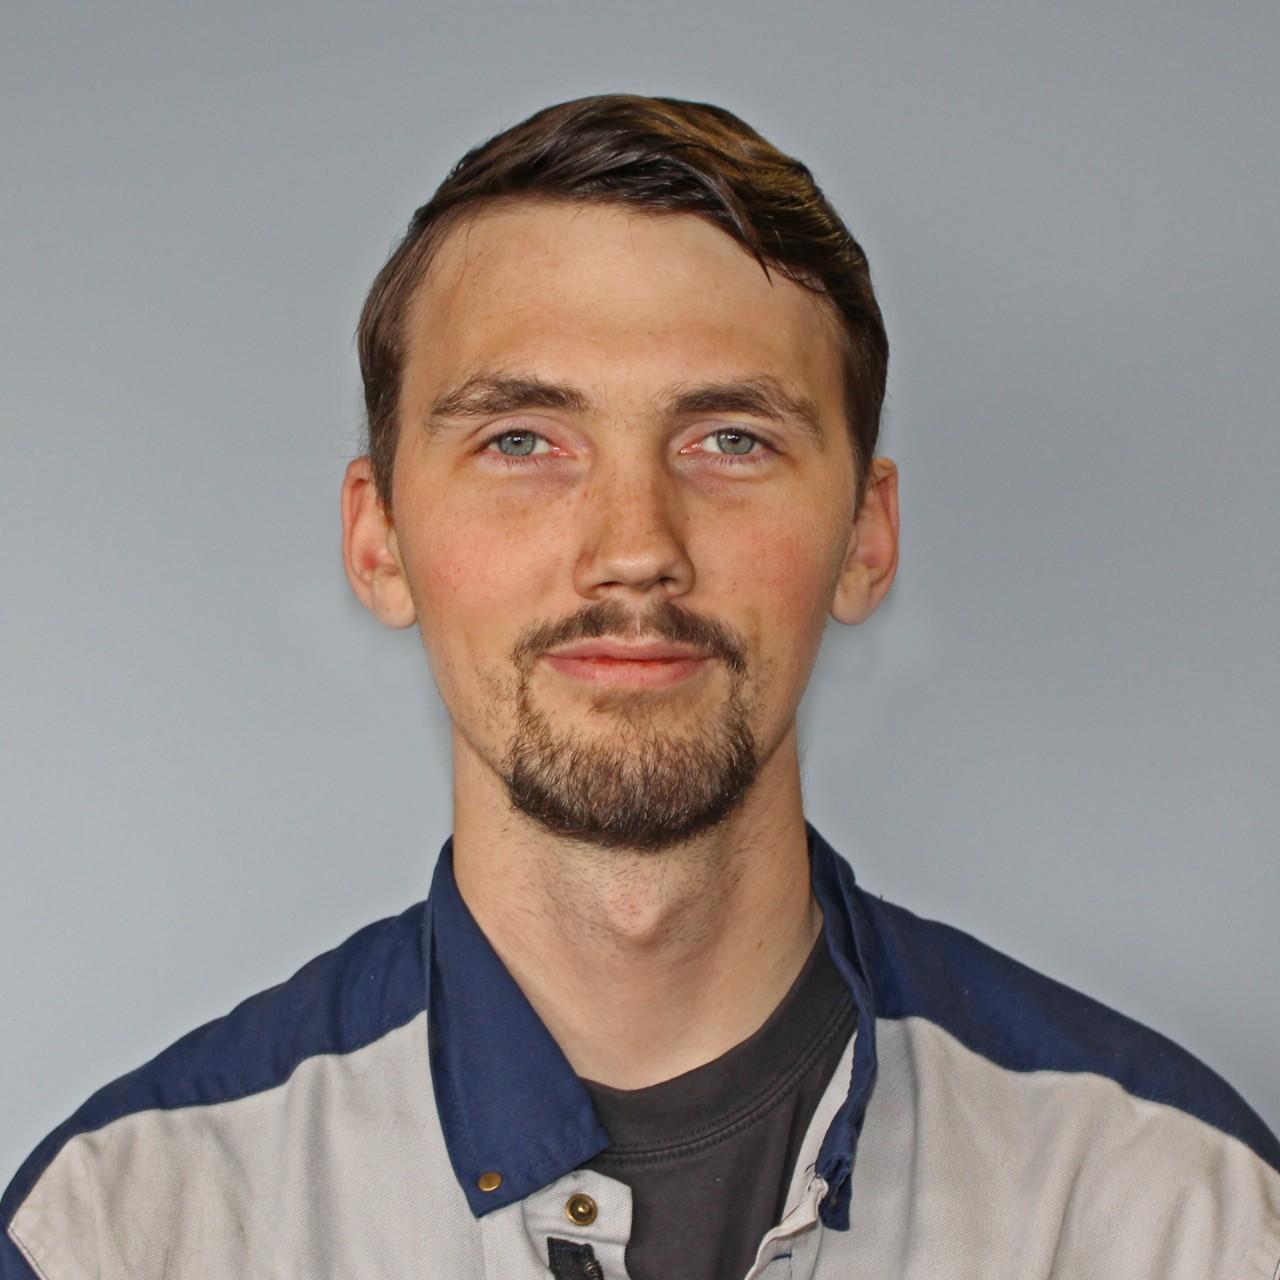 Tobias Håkansson